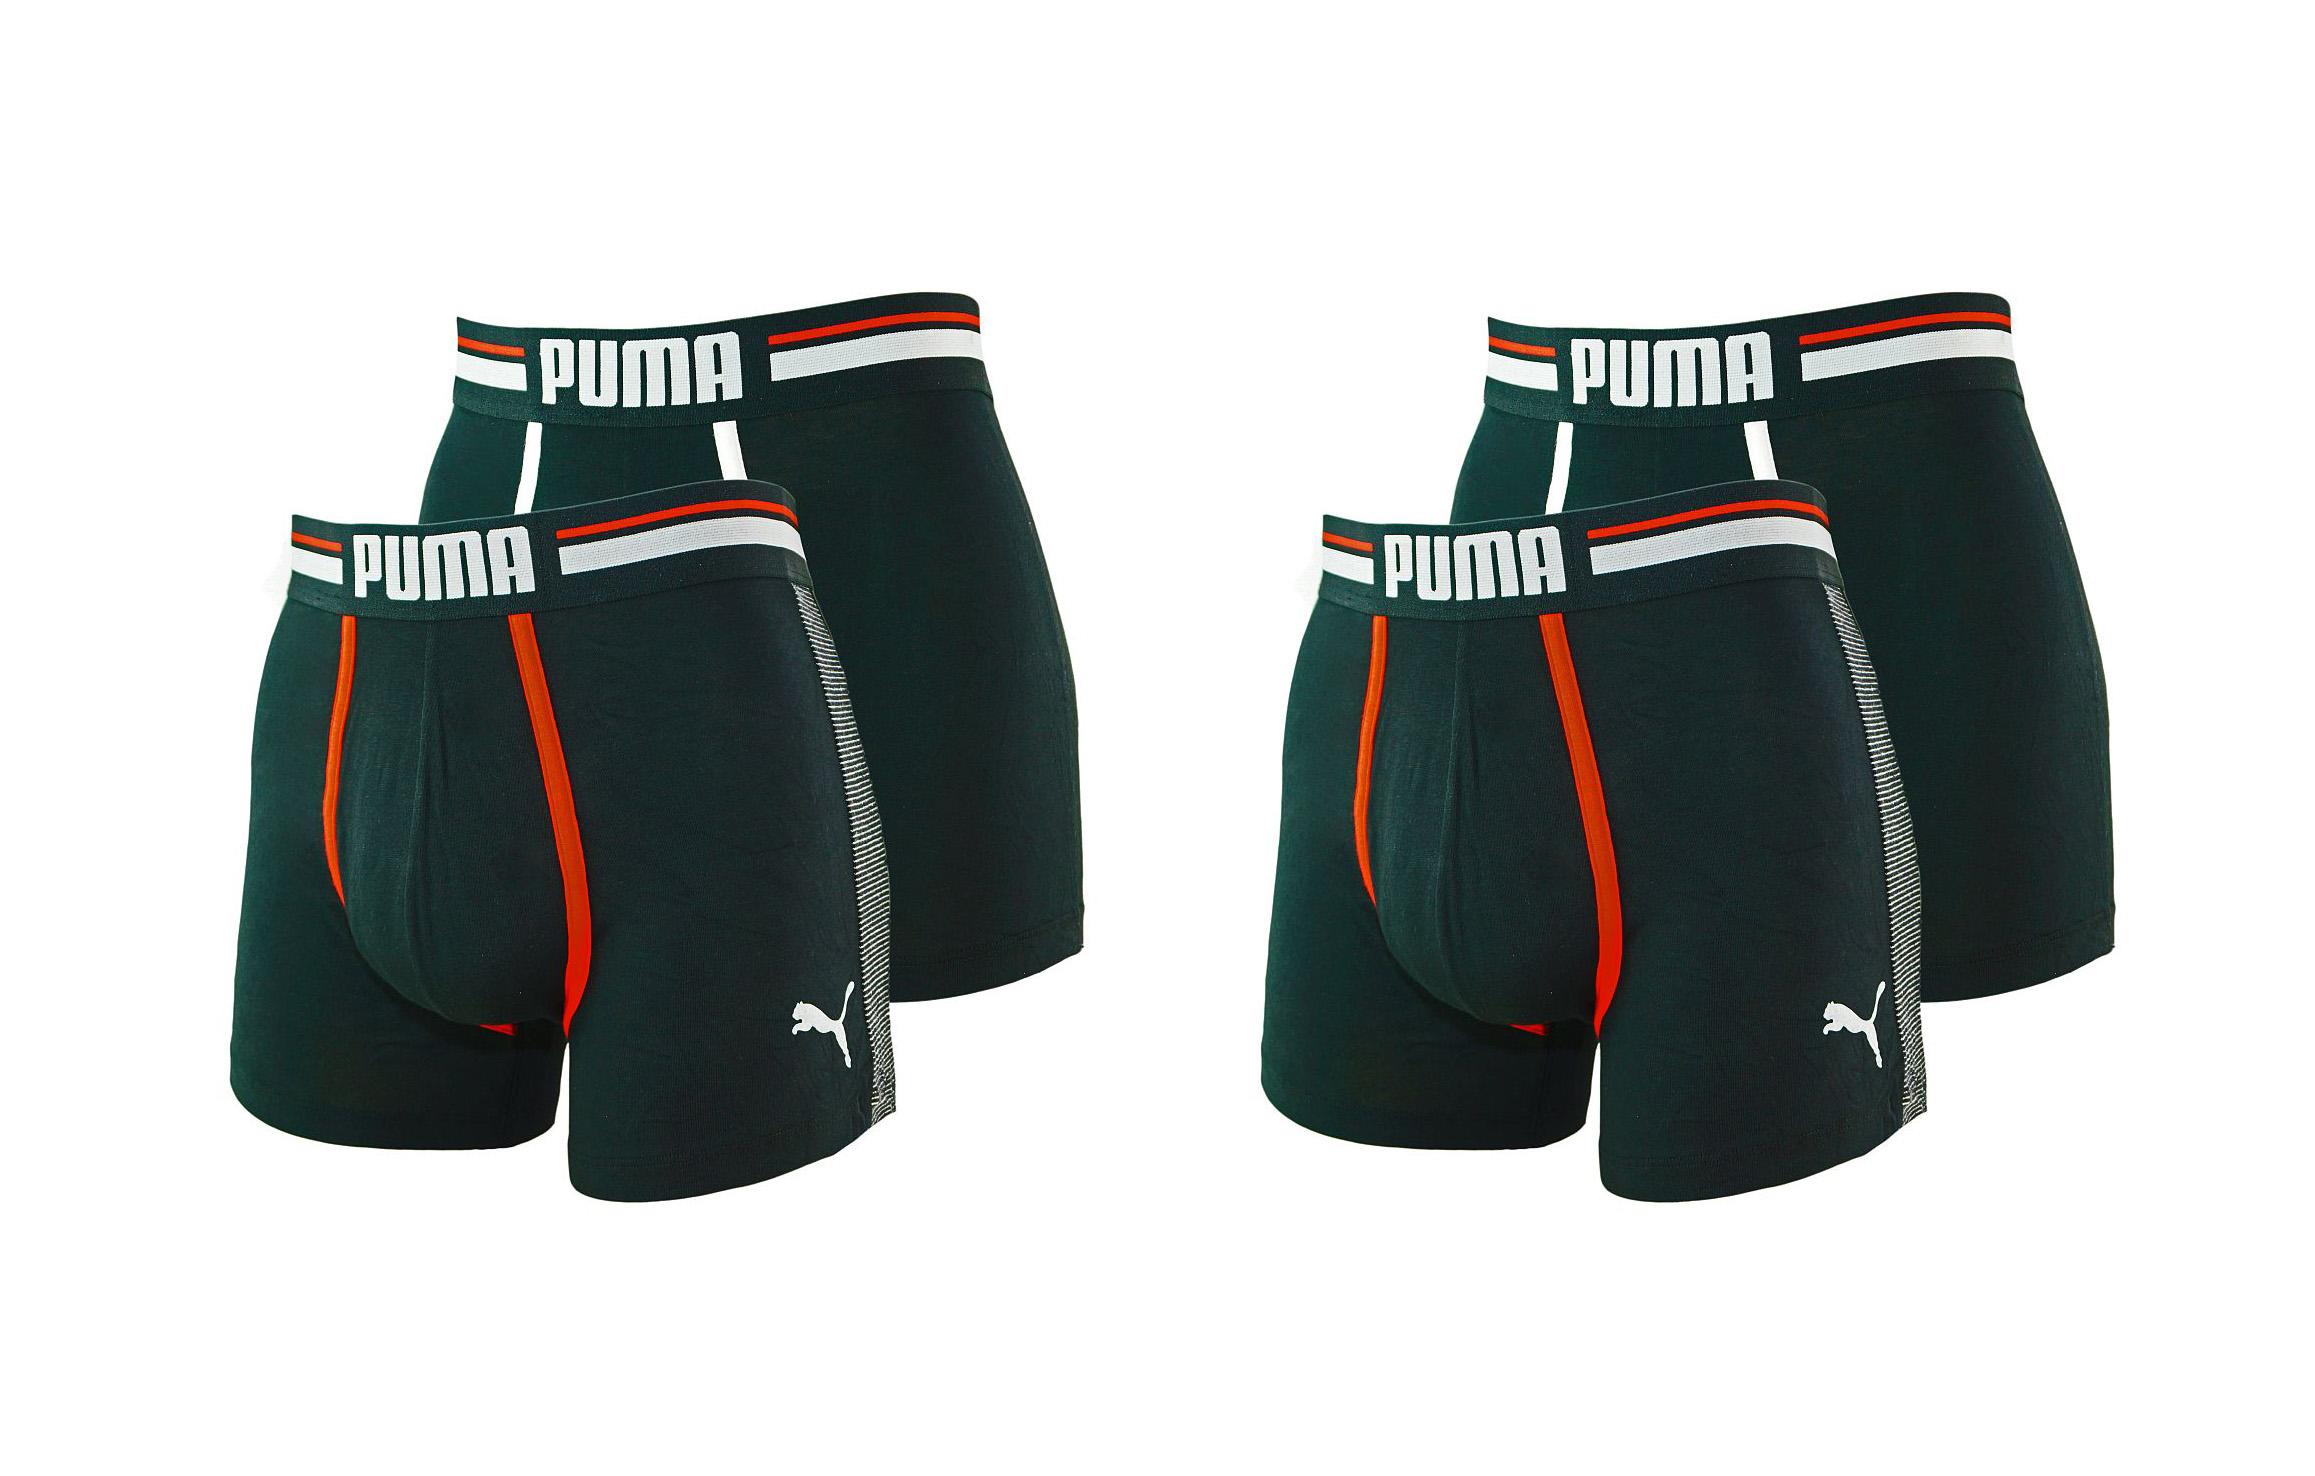 PUMA Shorts Unterhosen 2 x 2er Pack Boxer 571005001 200 020 black SF17-PMS2